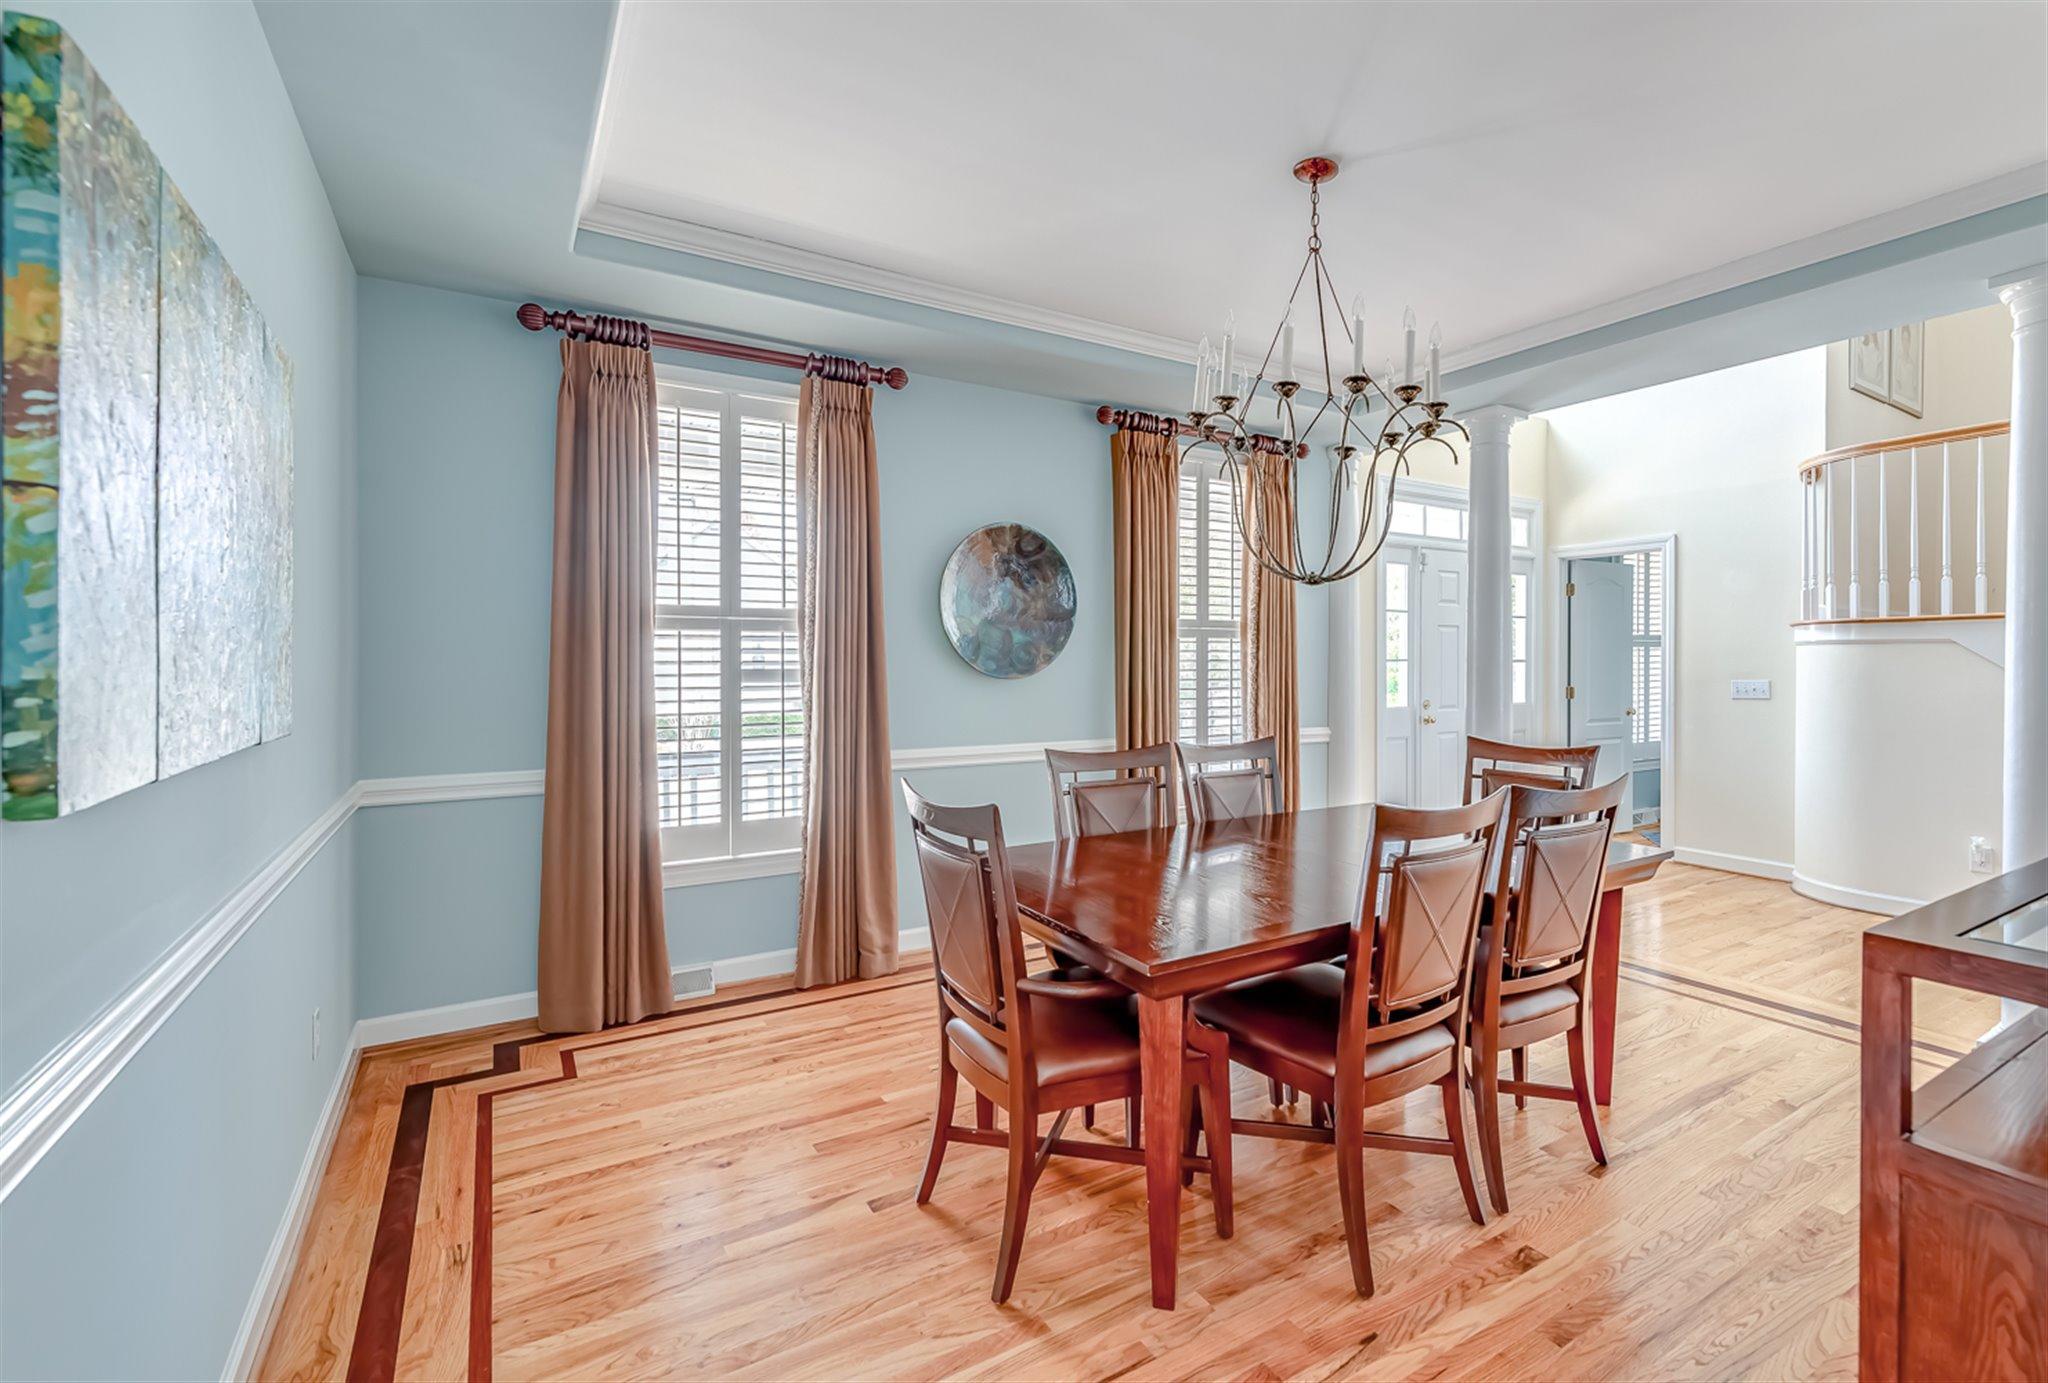 Indigo Point Homes For Sale - 50 Indigo Point, Charleston, SC - 20